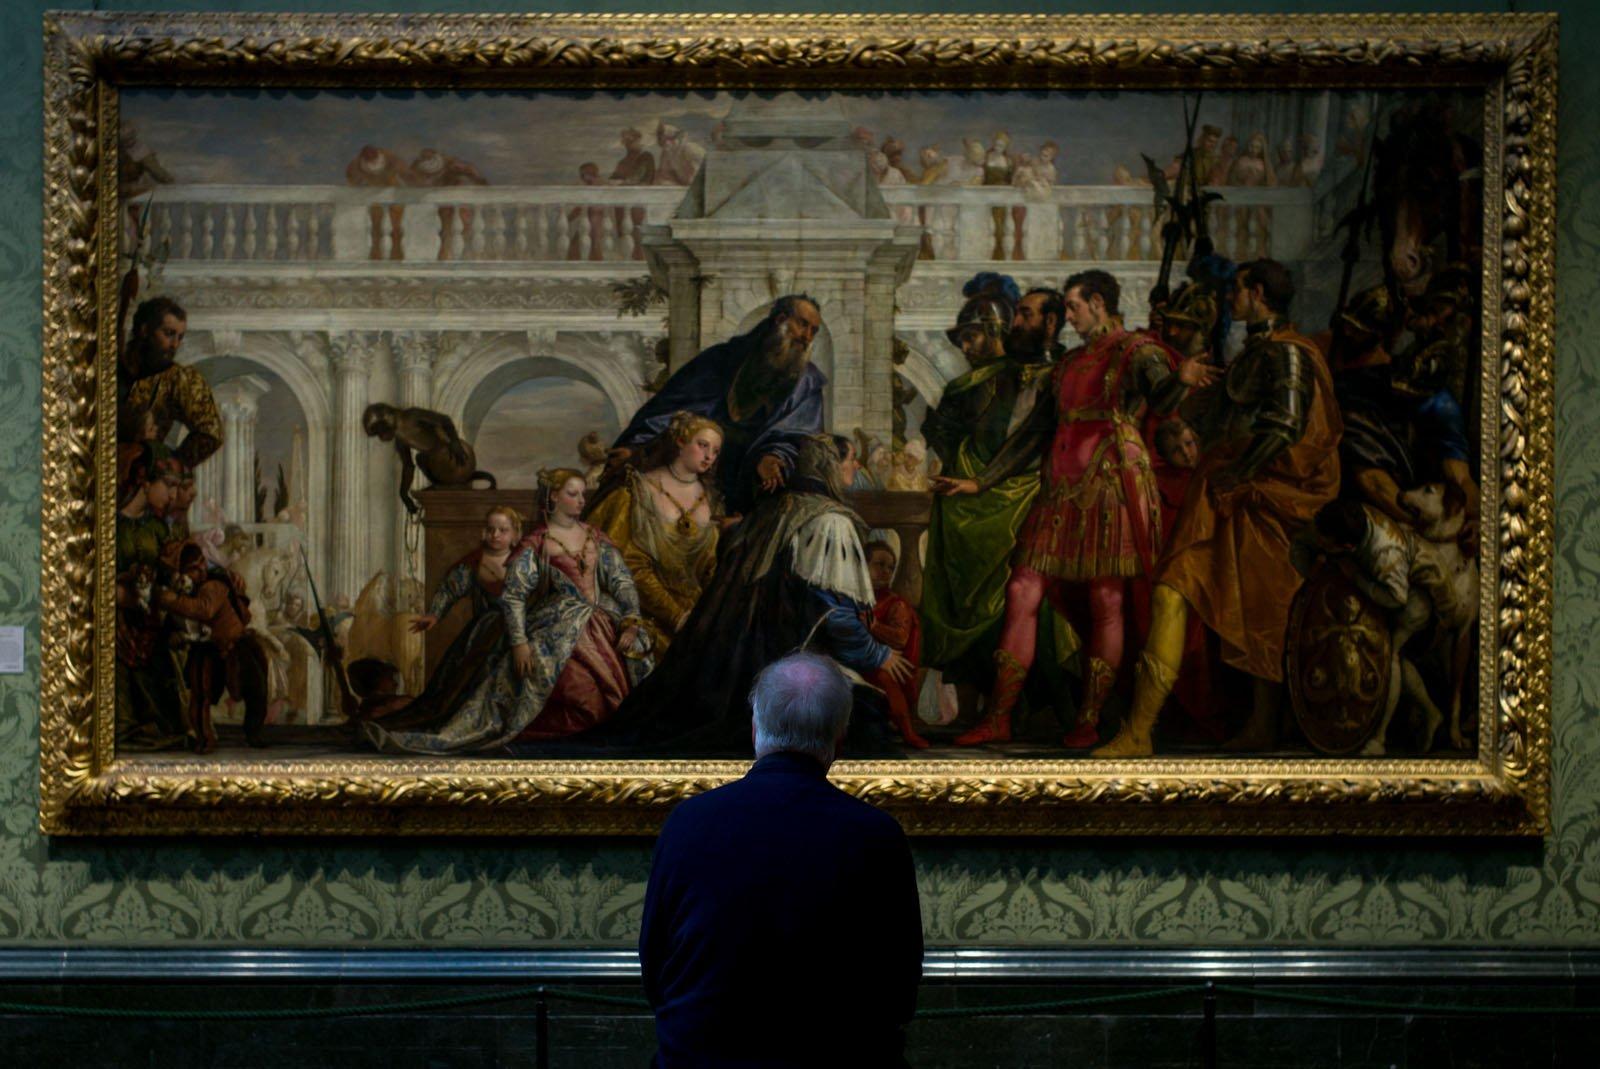 Paolo Veronese (1528-1588) - 'The Family of Darius before Alexander'